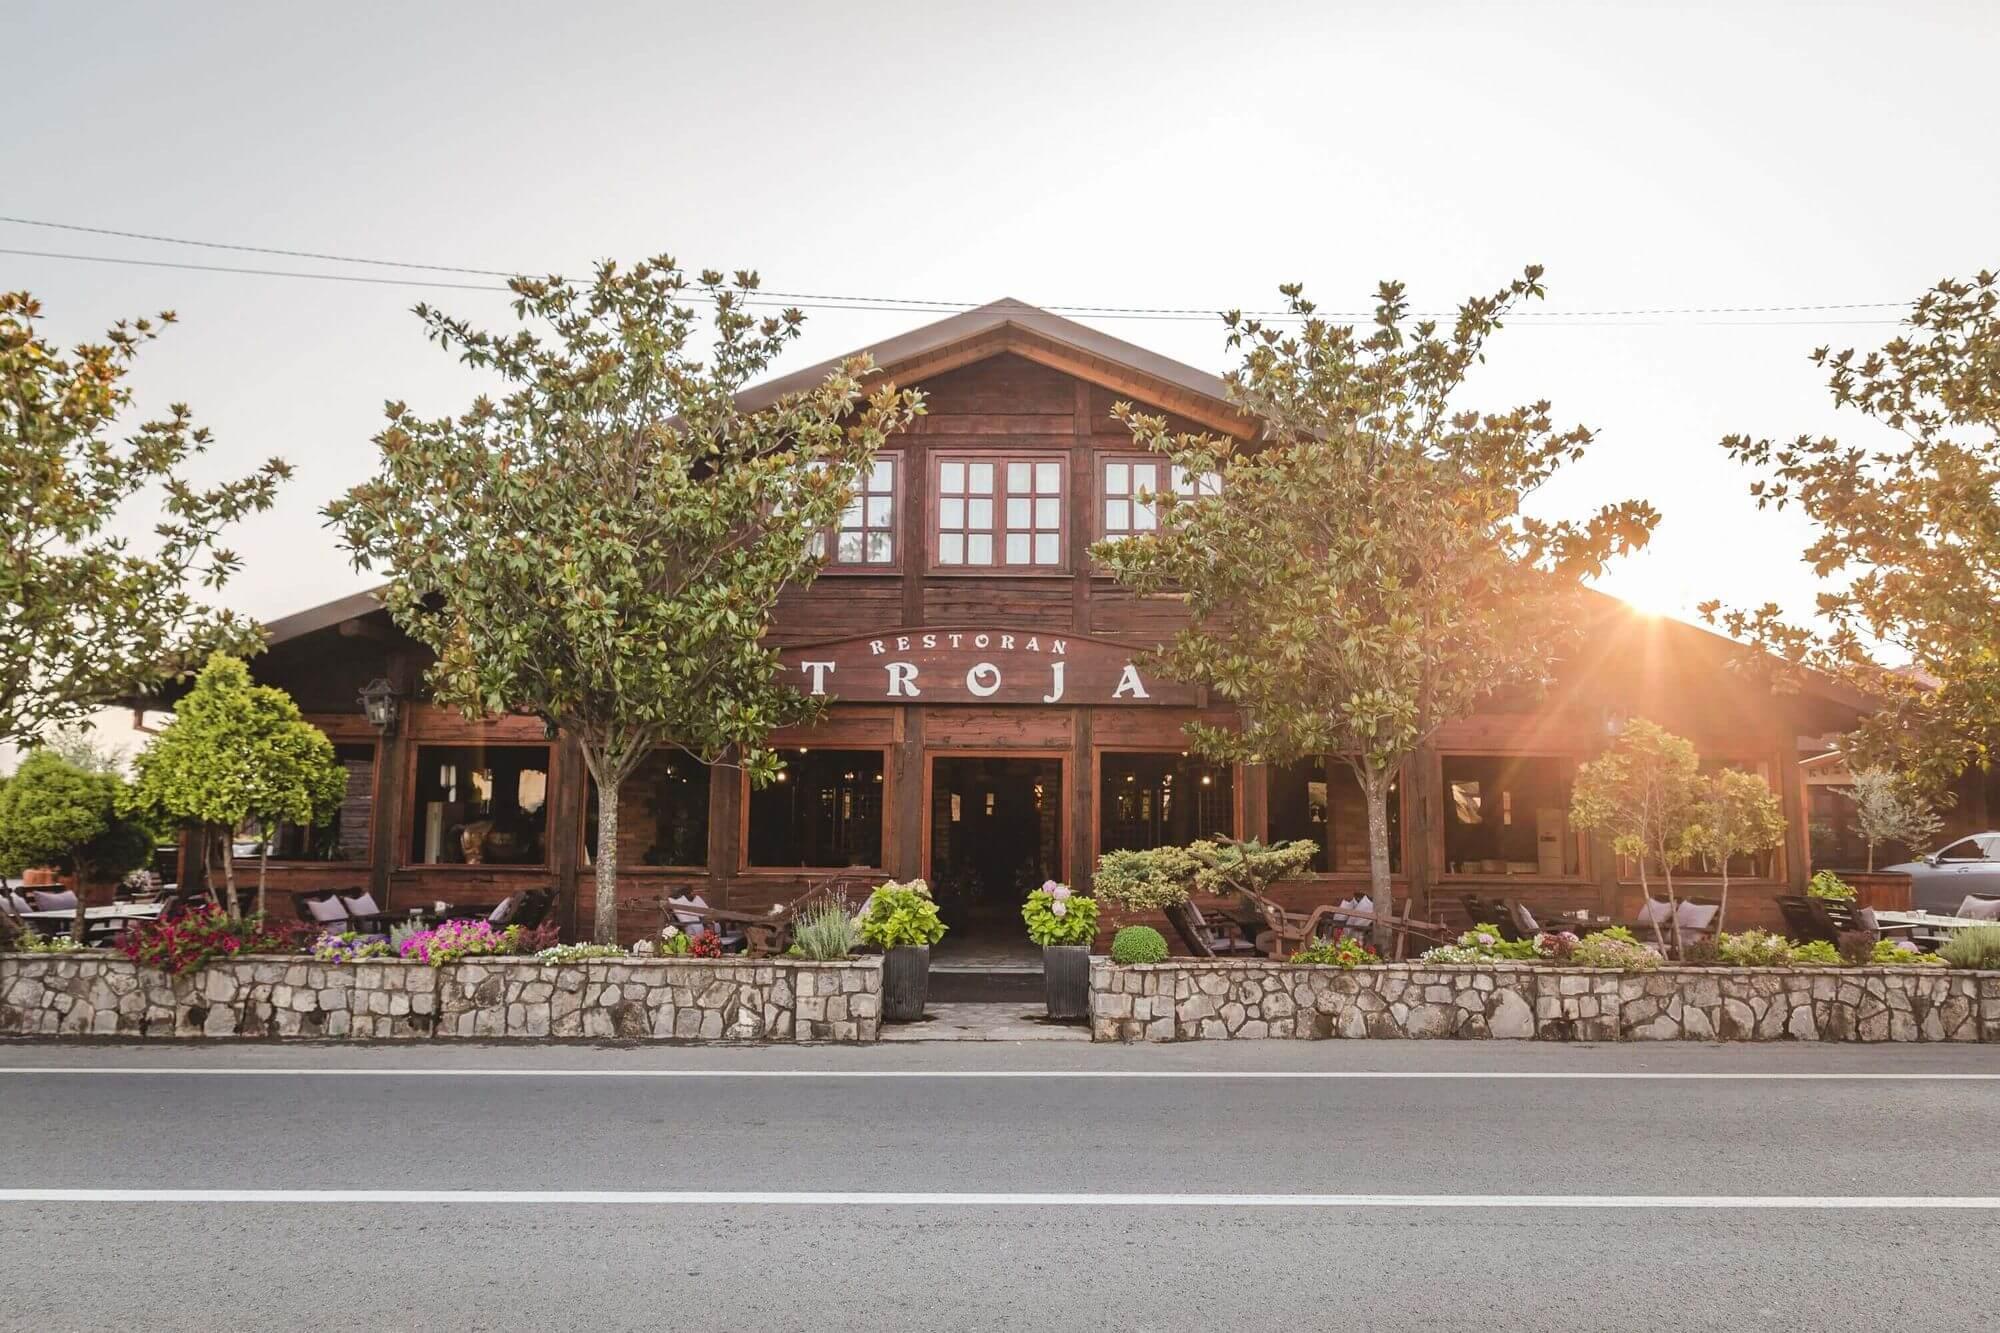 Nacionalni restoran TROJA cover photo